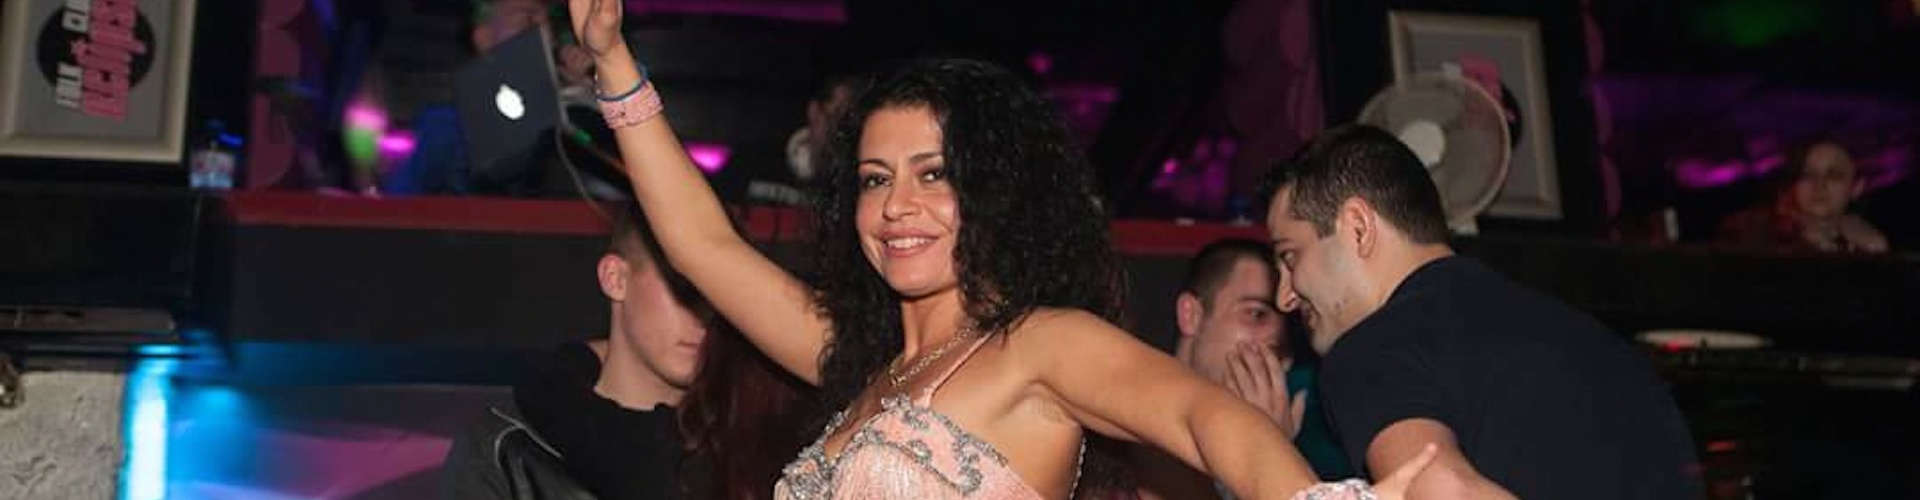 Снимка на танцьорка за парти